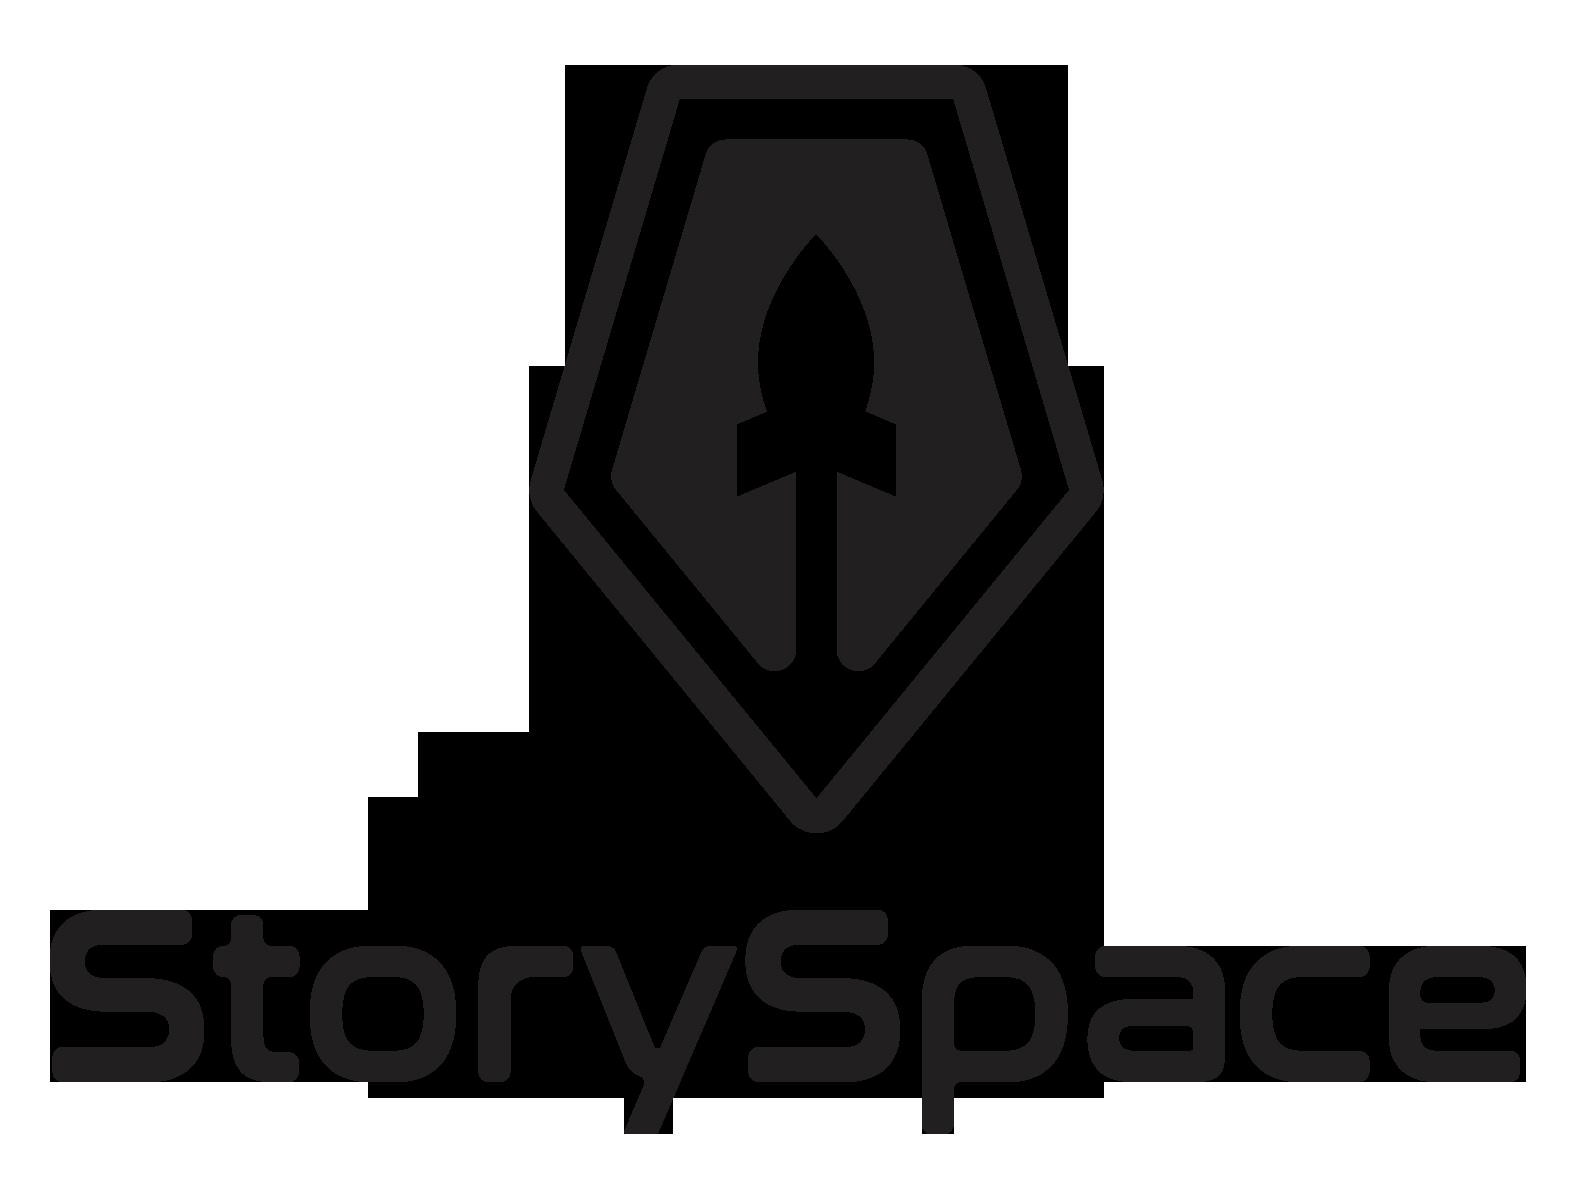 quib storyspace vertical BLACK.png